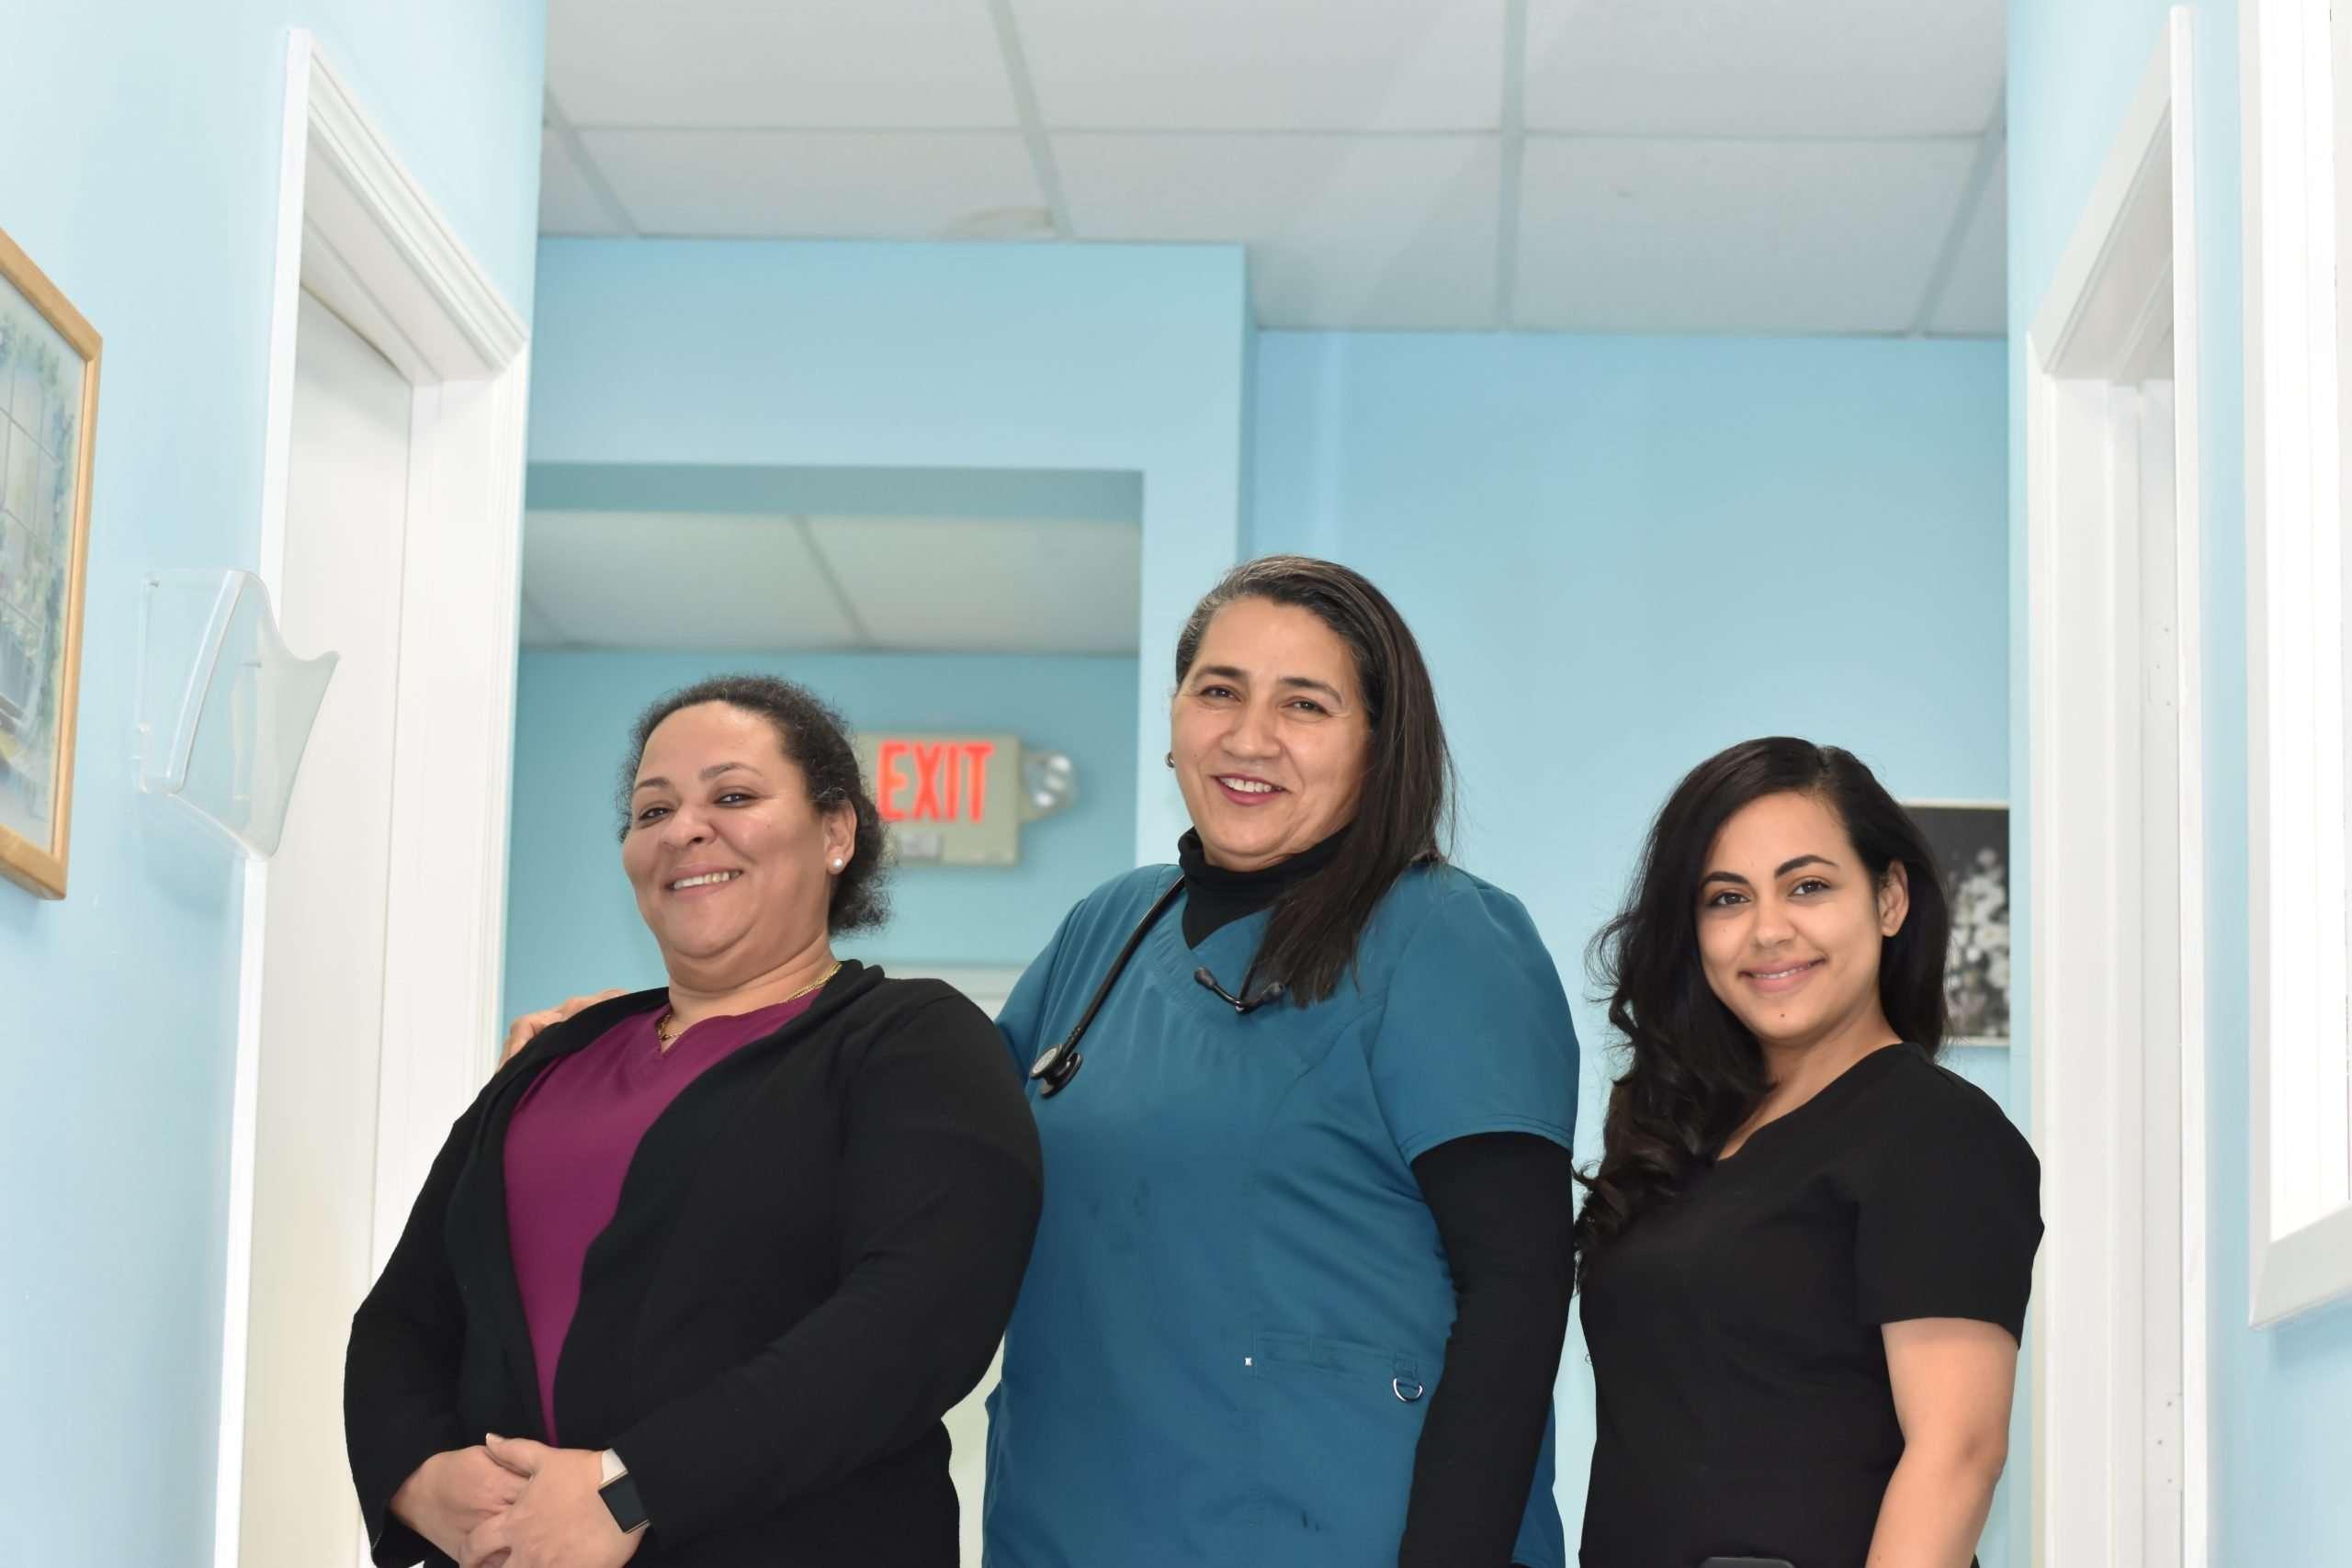 Clinica Hispana Rubymed Houston TX scaled